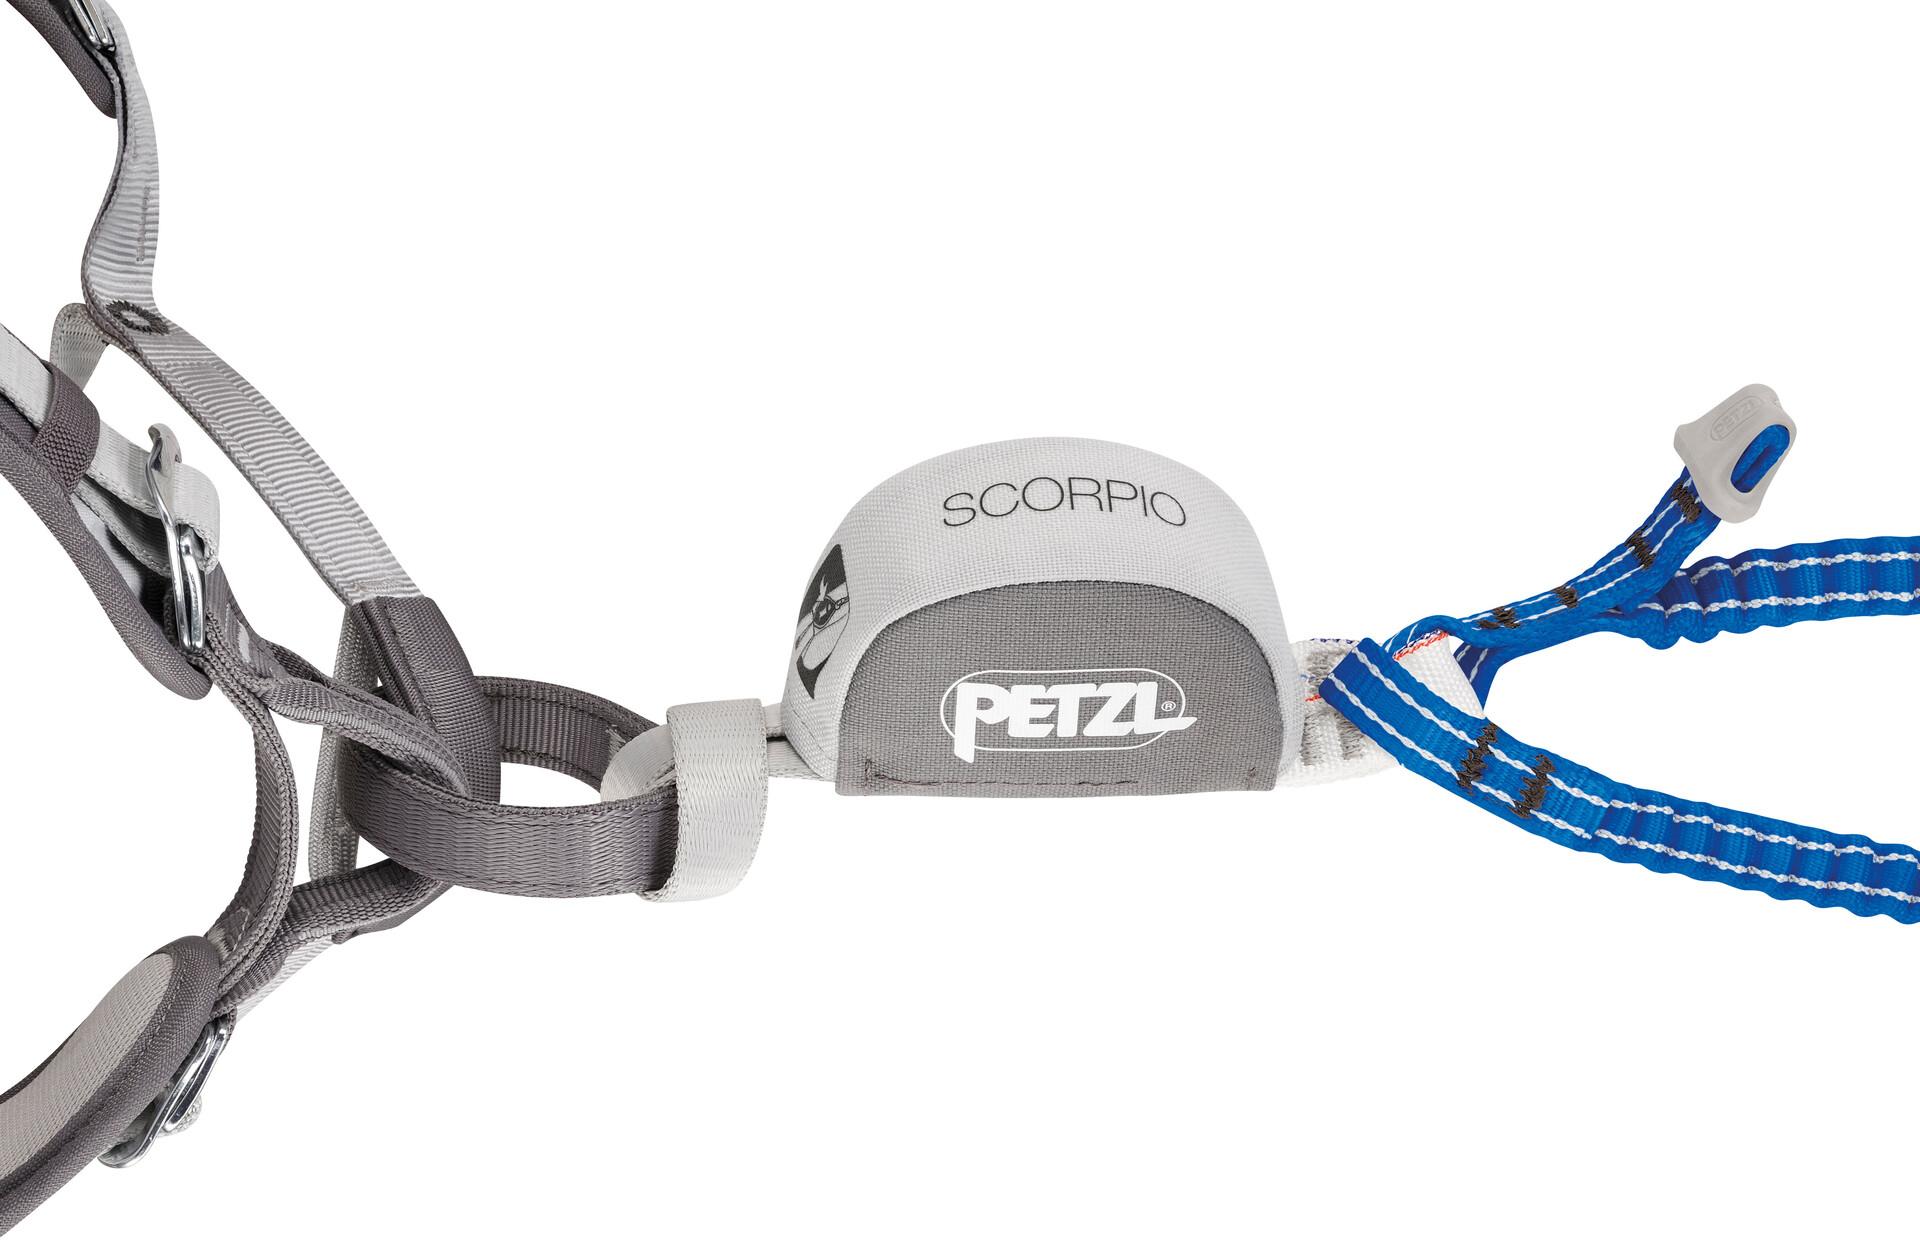 Klettersteig Set Gurt : Petzl kit via ferrata eashook klettersteigset mit corax boreo und